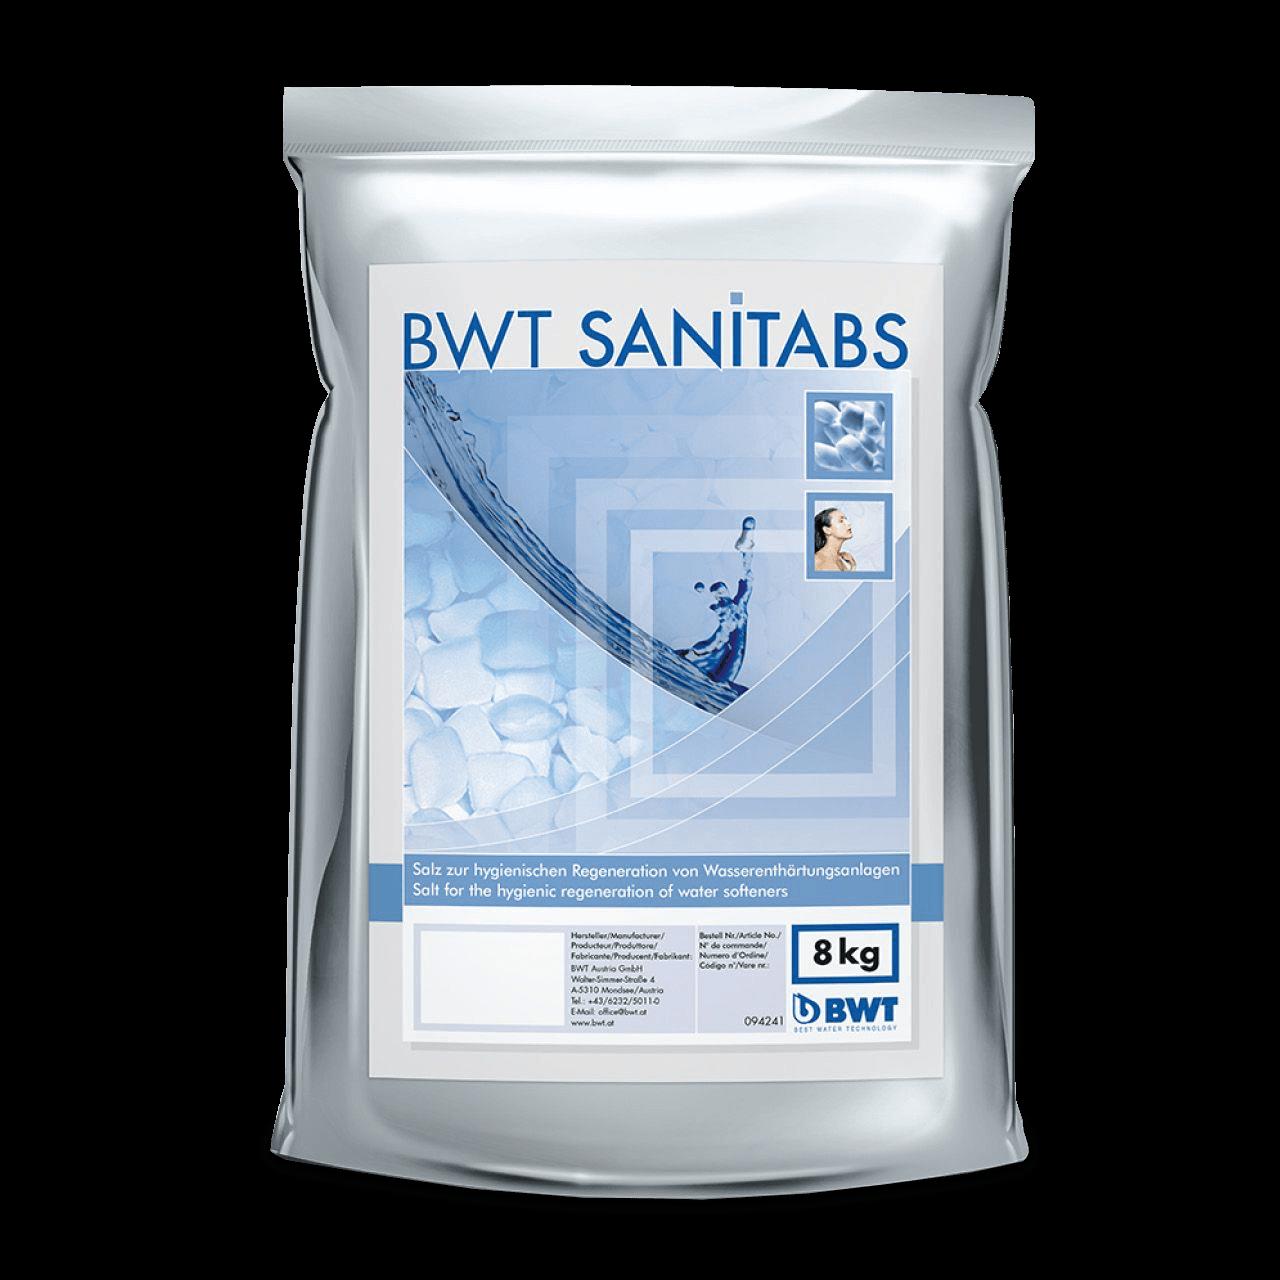 BWT Sanitabs 8 kg